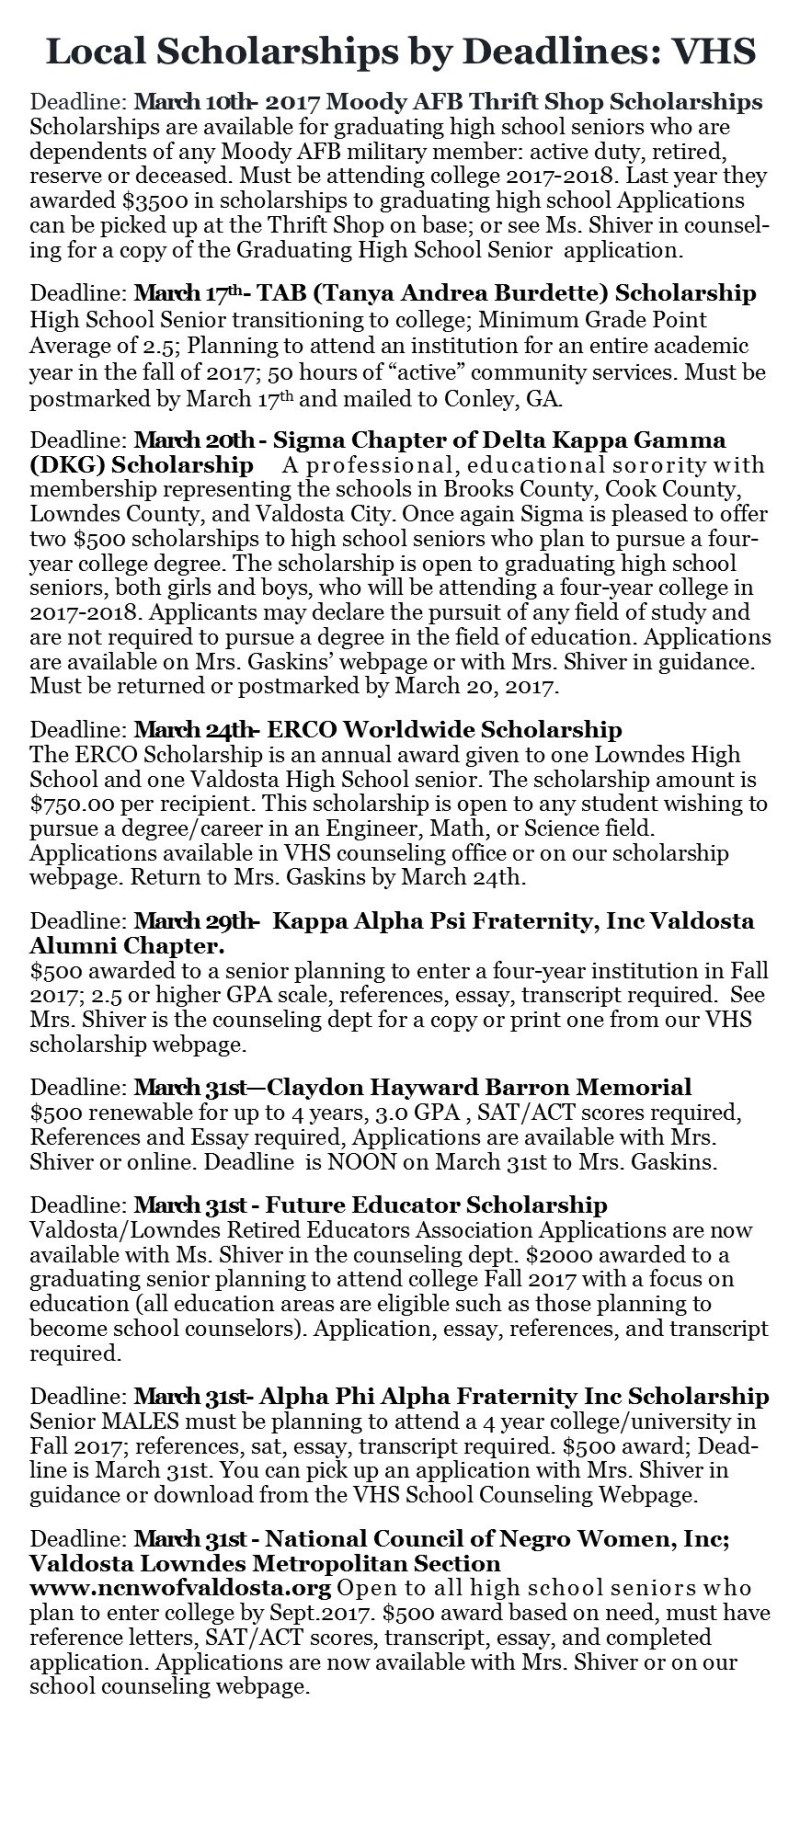 012 Shorty Scholarships Withys For High School Seniors Poemsrom Co Tinetby5eqpfuhec2cd5mlc30c12uavsxxp5rodkzqo In California Texas Class Of Free No Amazing Short Essay College Easy Full